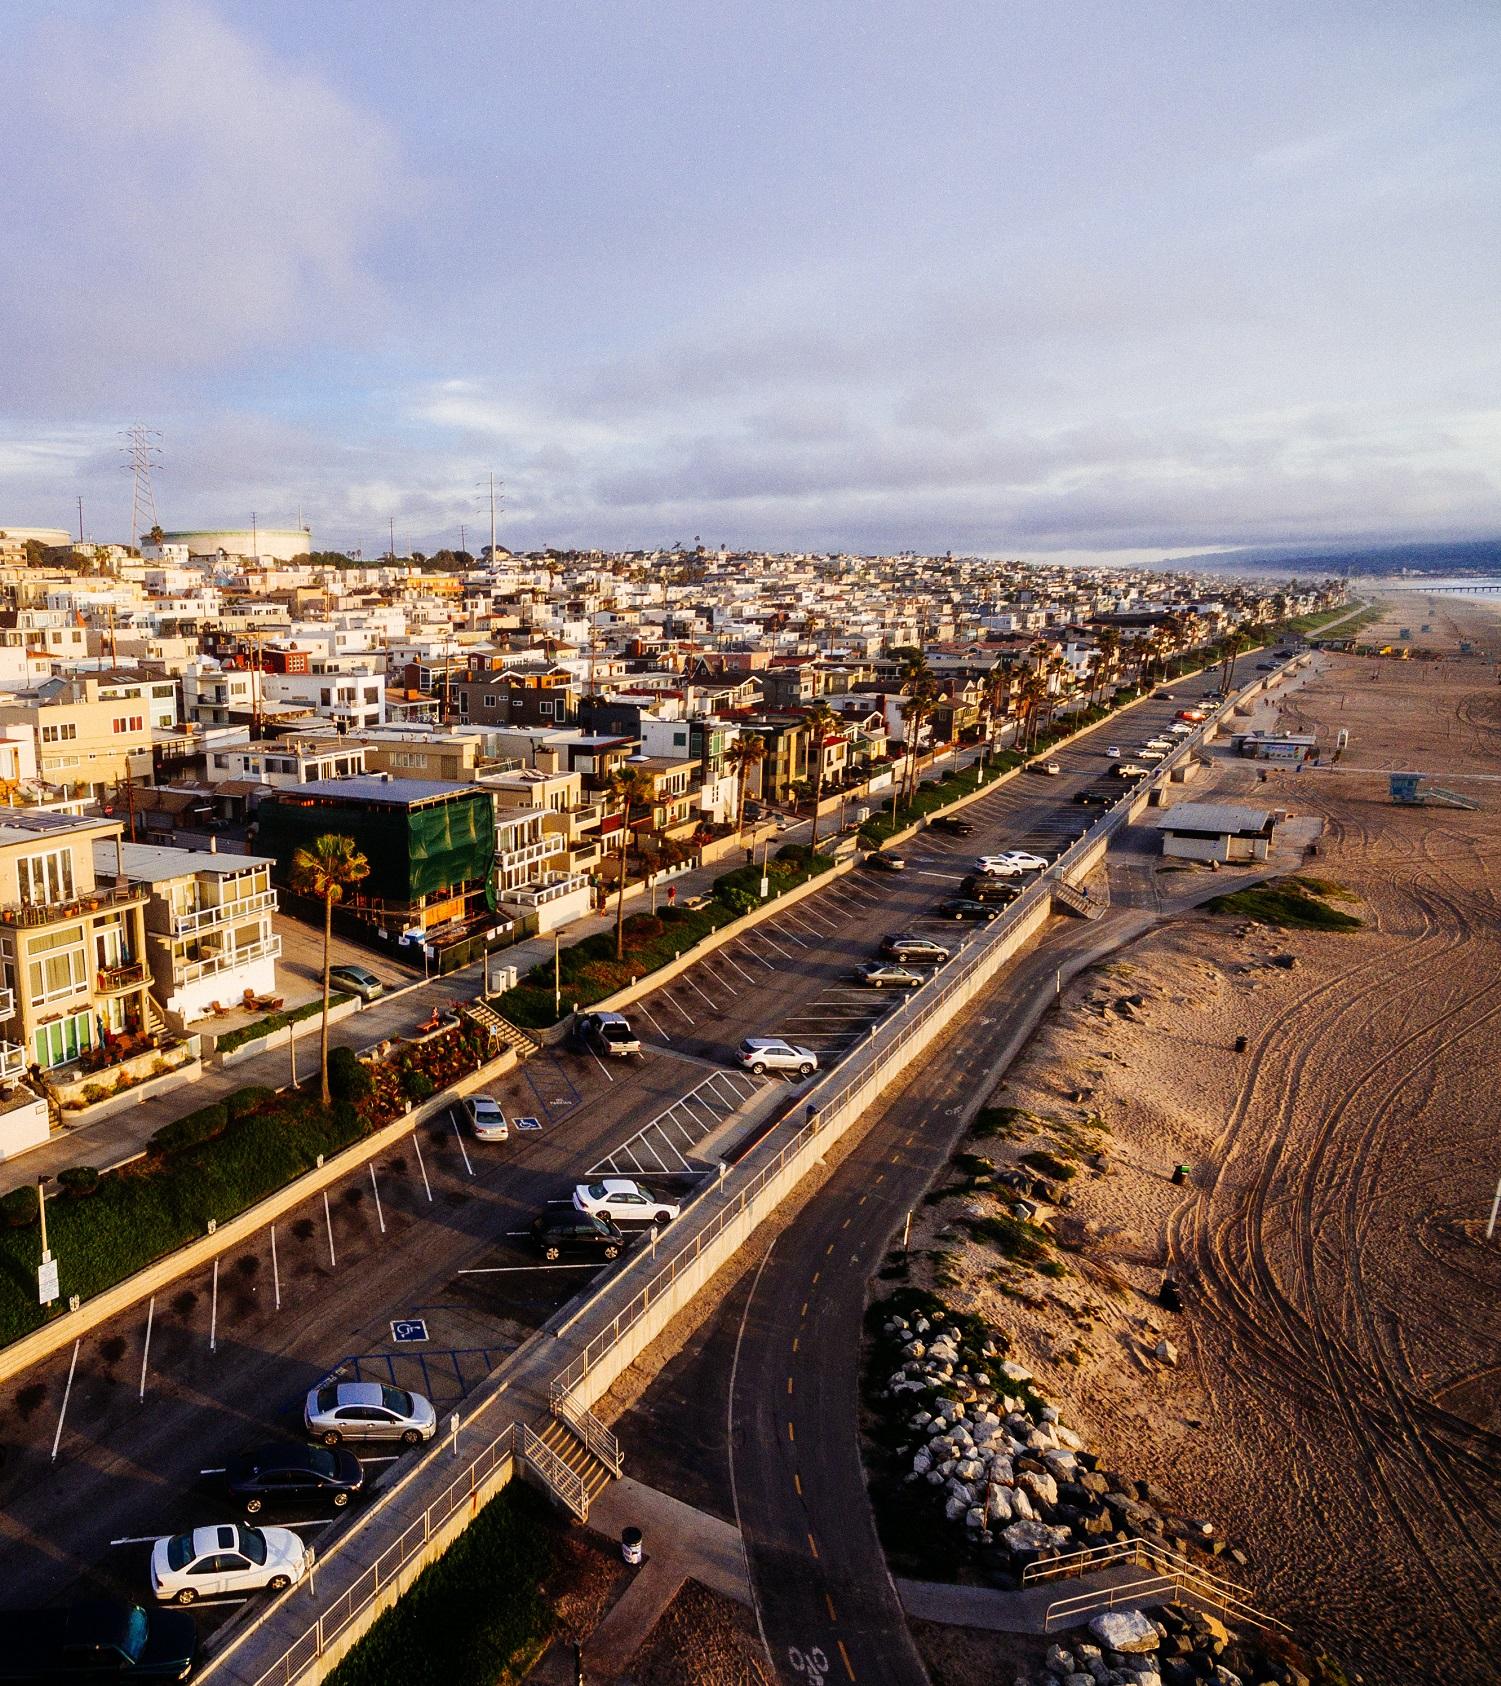 el porto manhattan beach skyline